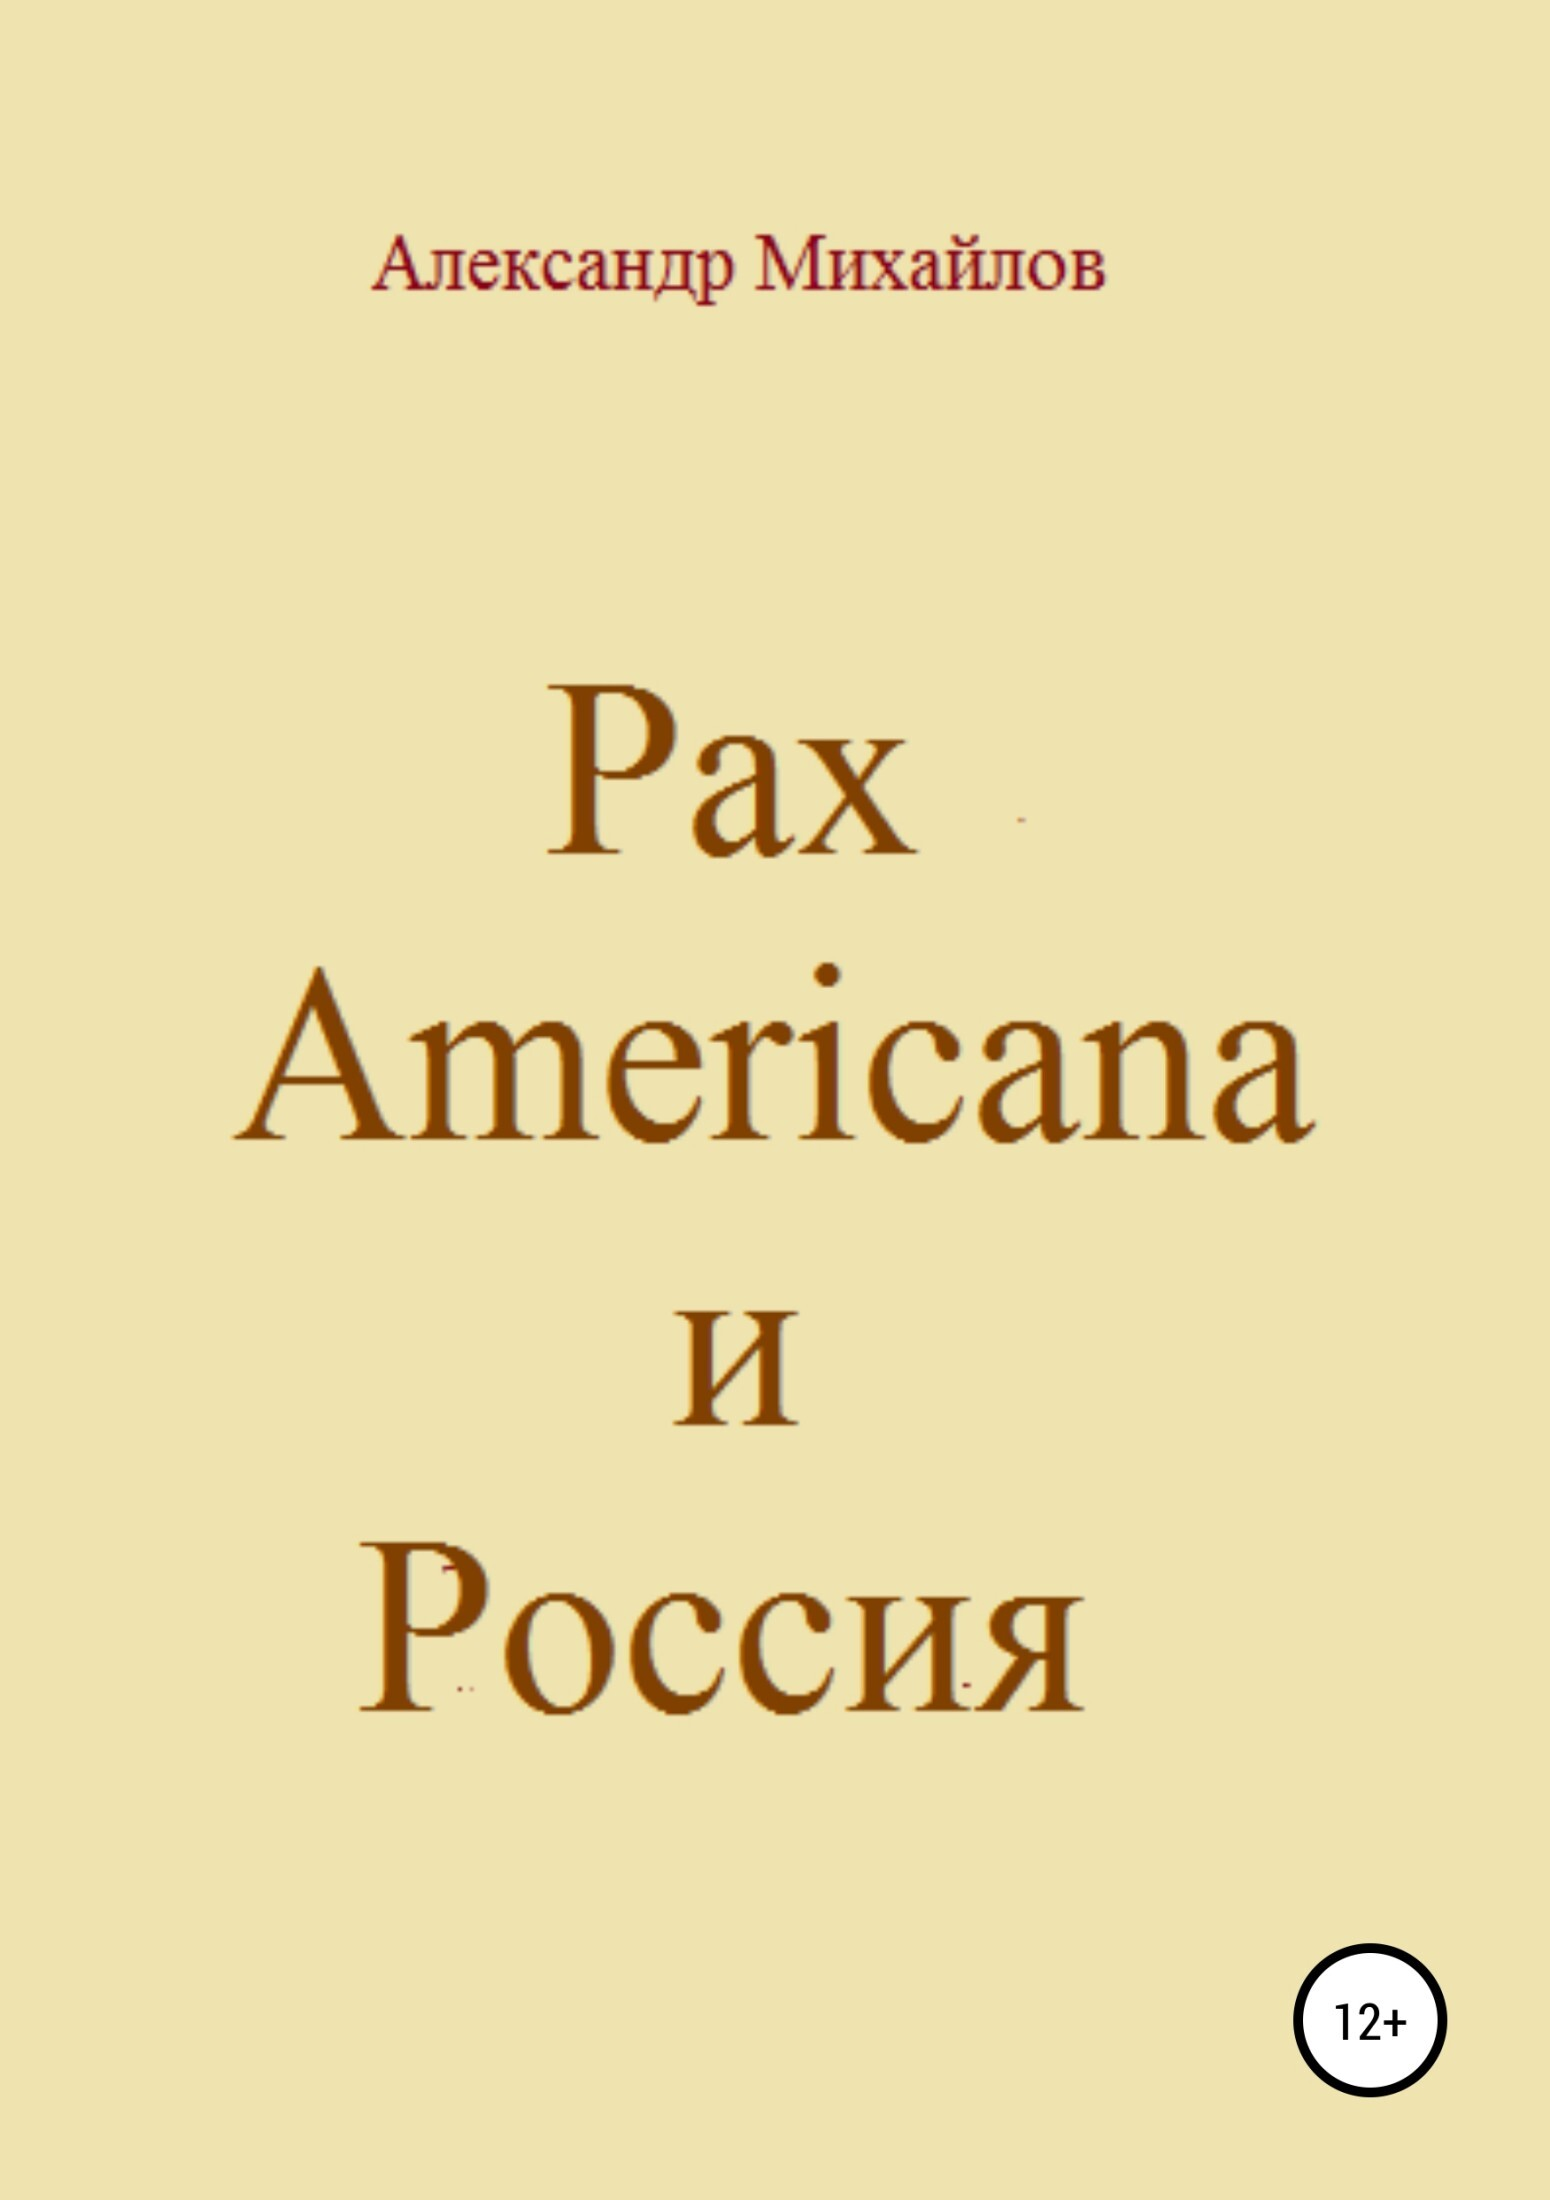 Александр Григорьевич Михайлов Pax Americana и Россия